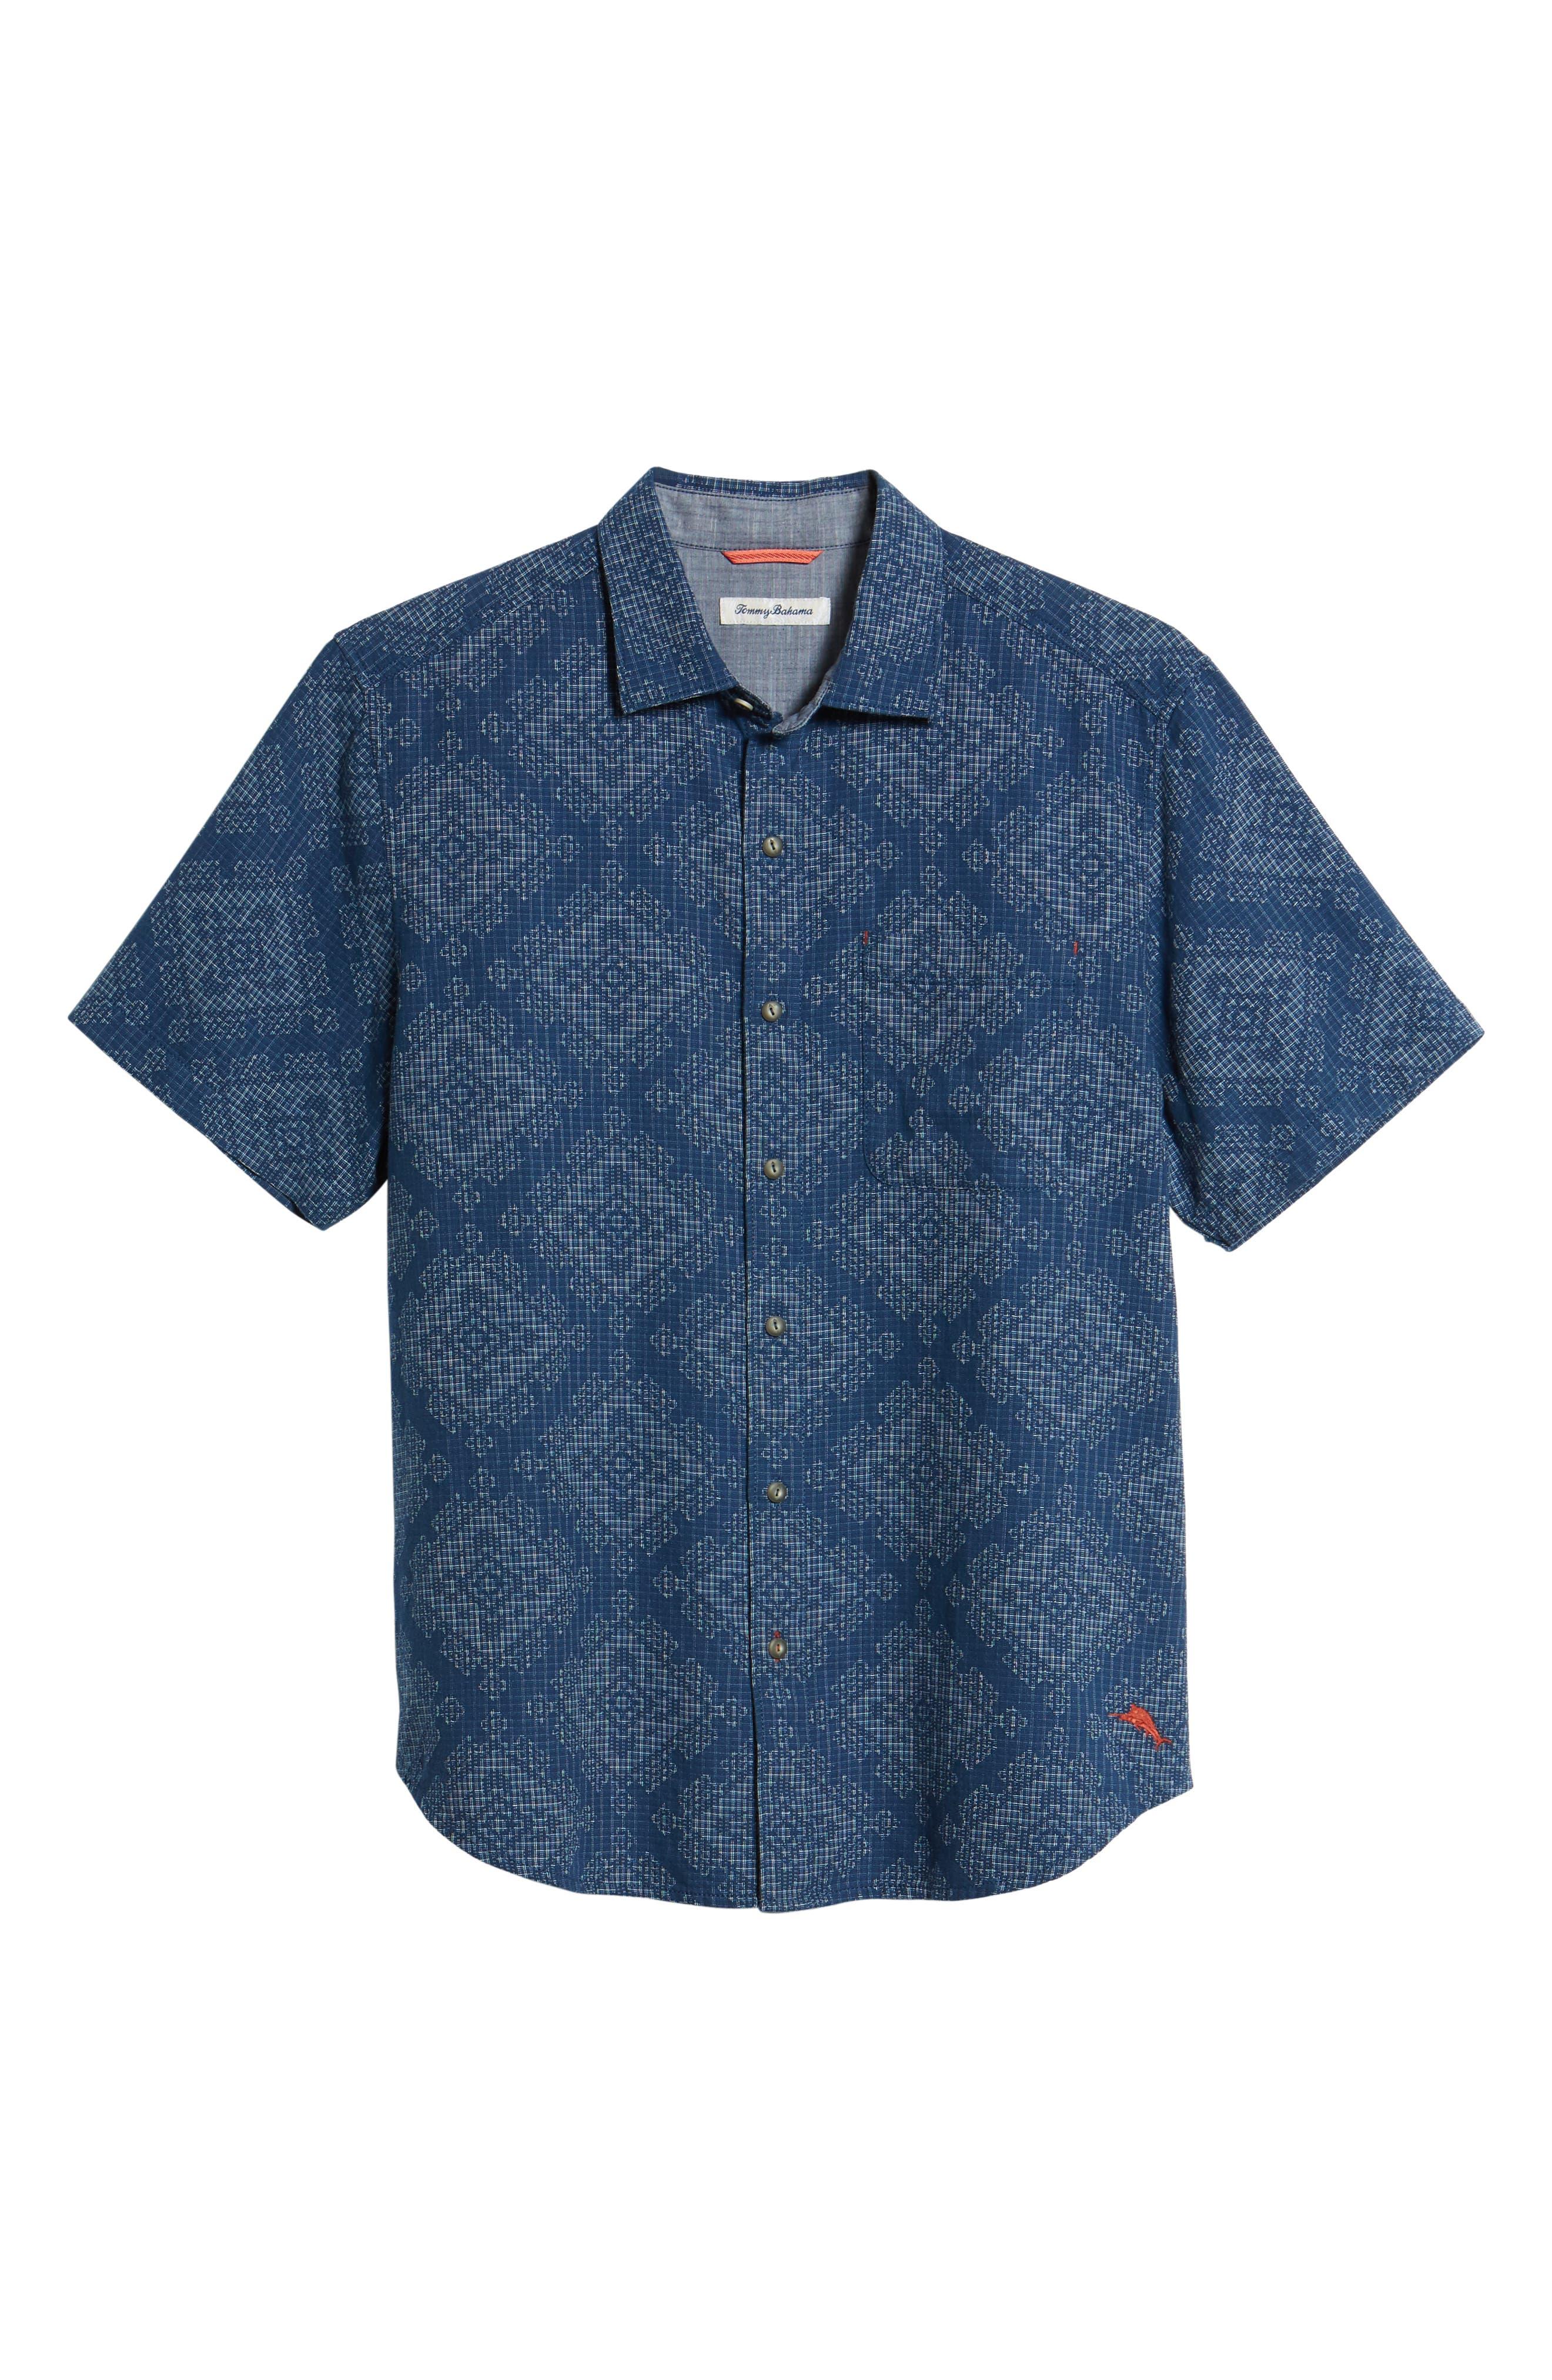 Geo de Mayo Sport Shirt,                             Alternate thumbnail 6, color,                             Throne Blue